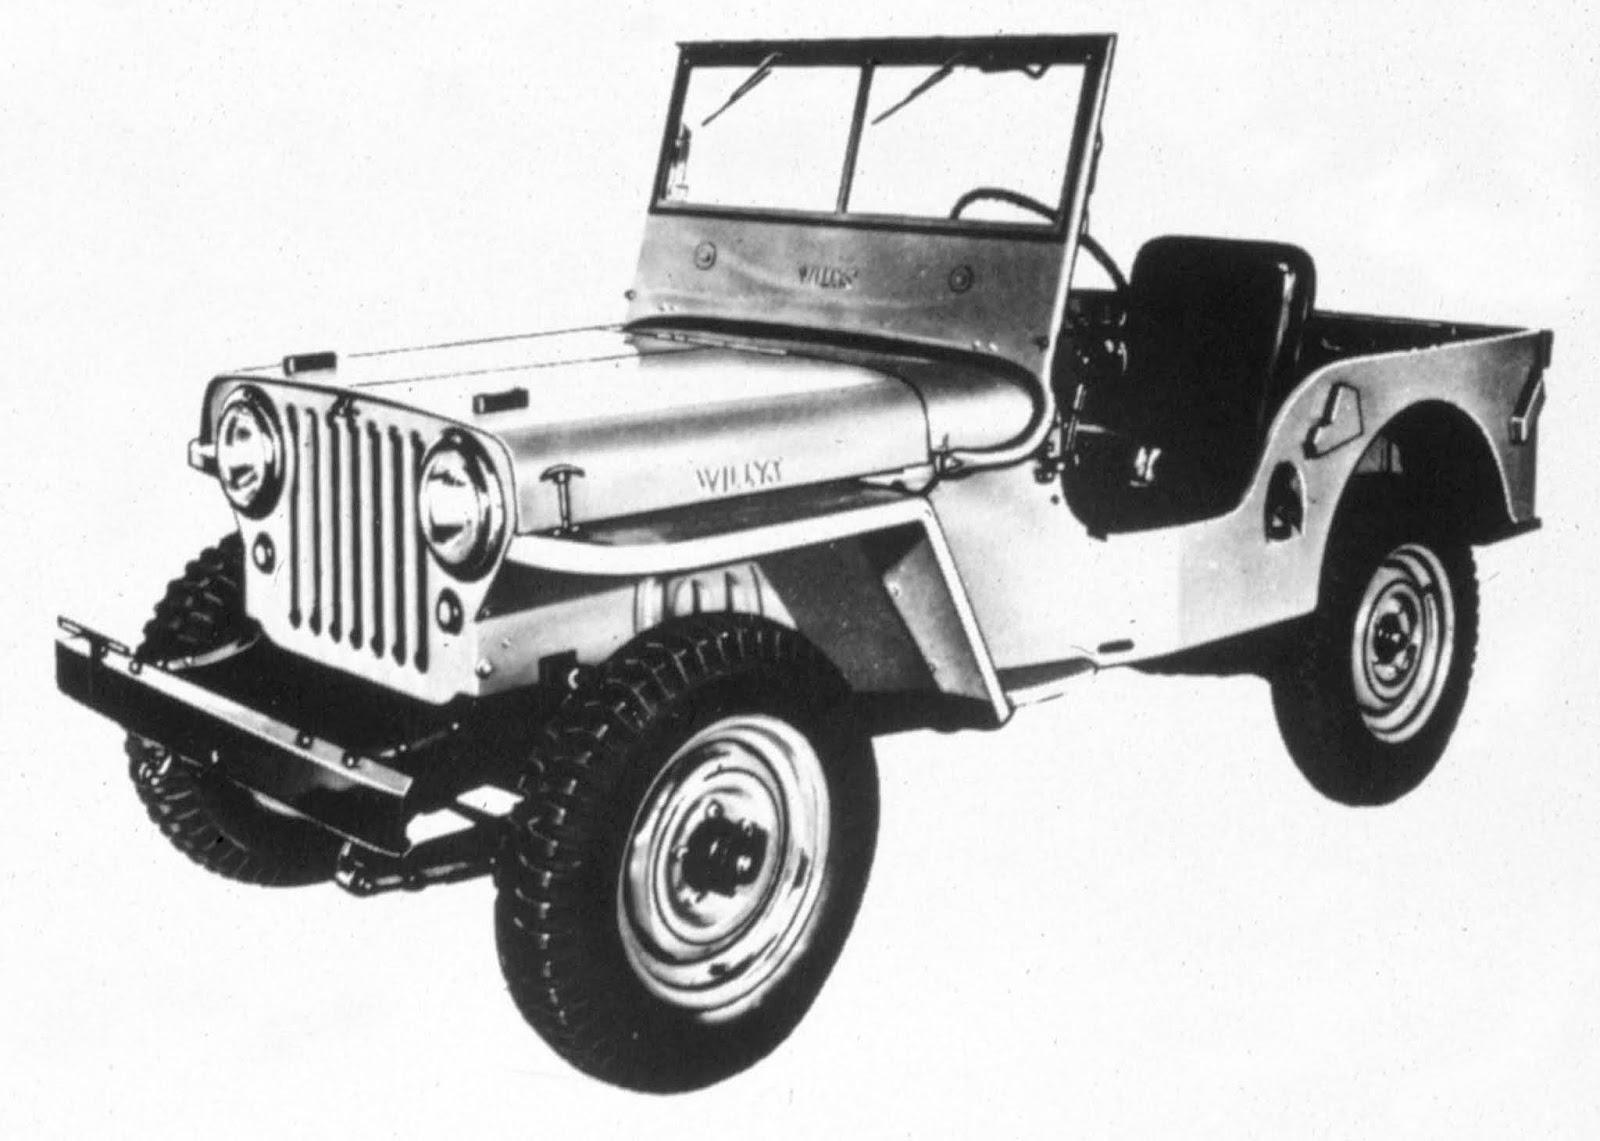 1945 Jeep CJ 2A Πώς... βασάνισαν το Jeep Willy's μέχρι να φτάσει στην παραγωγή Jeep, Jeep Willys, video, videos, Willys, zblog, ειδήσεις, ιστορικα